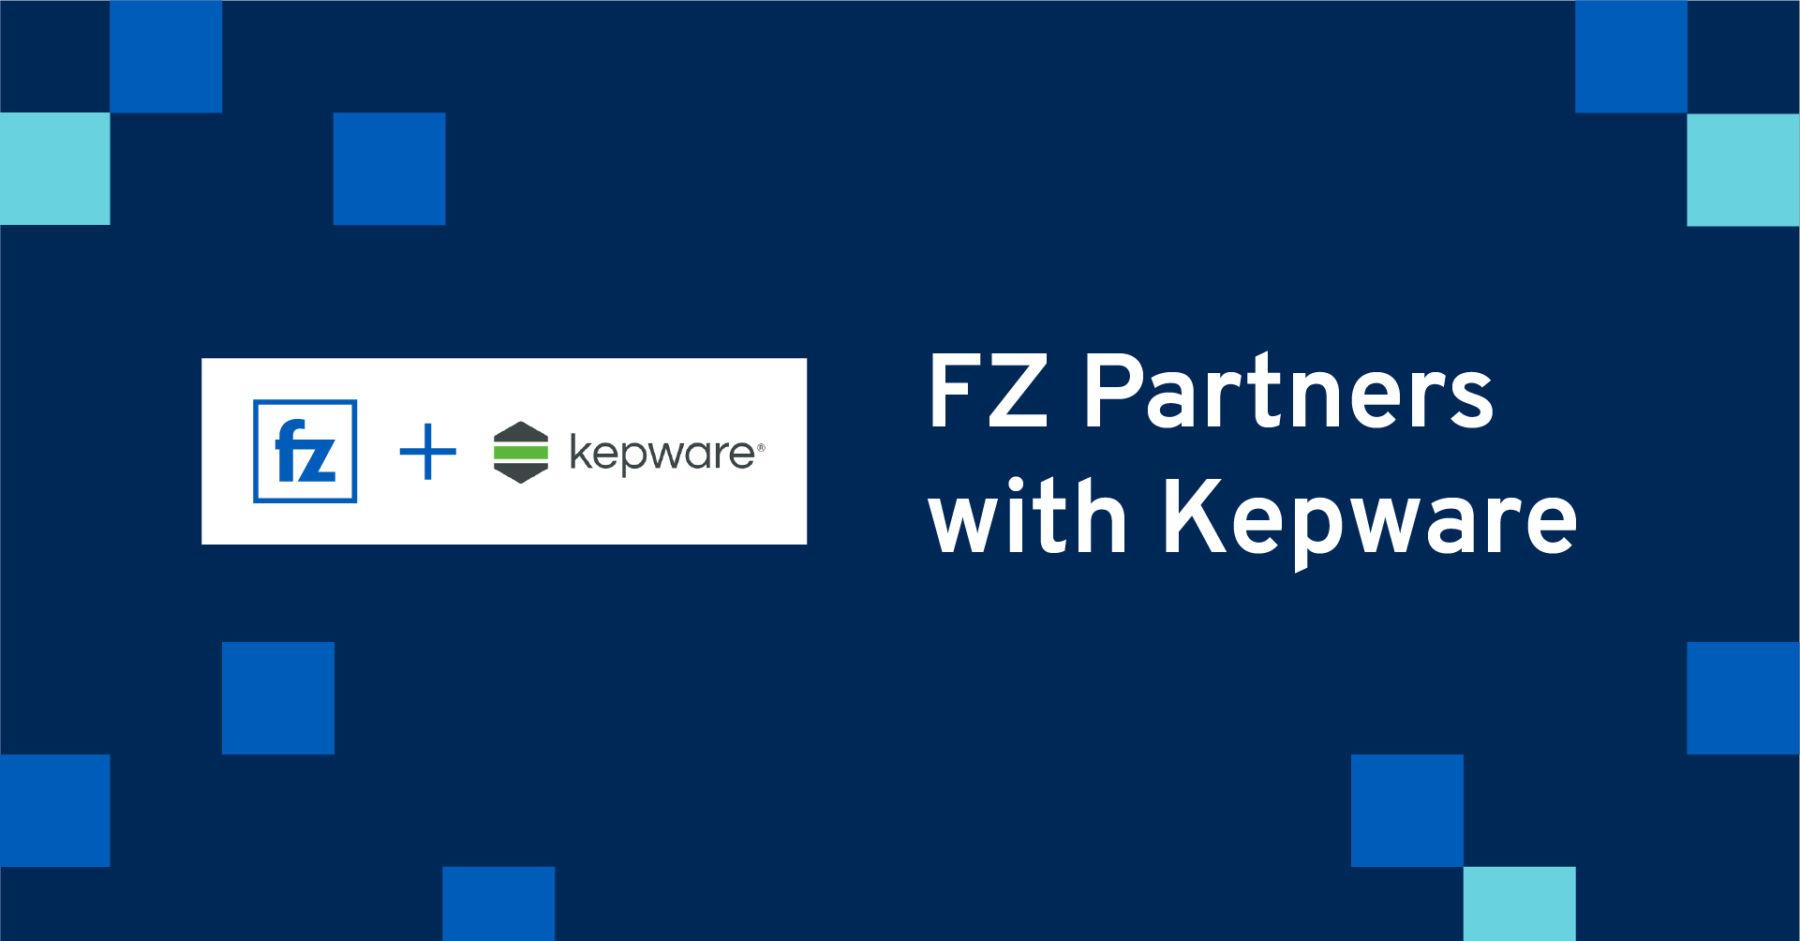 FZ partners with Kepware